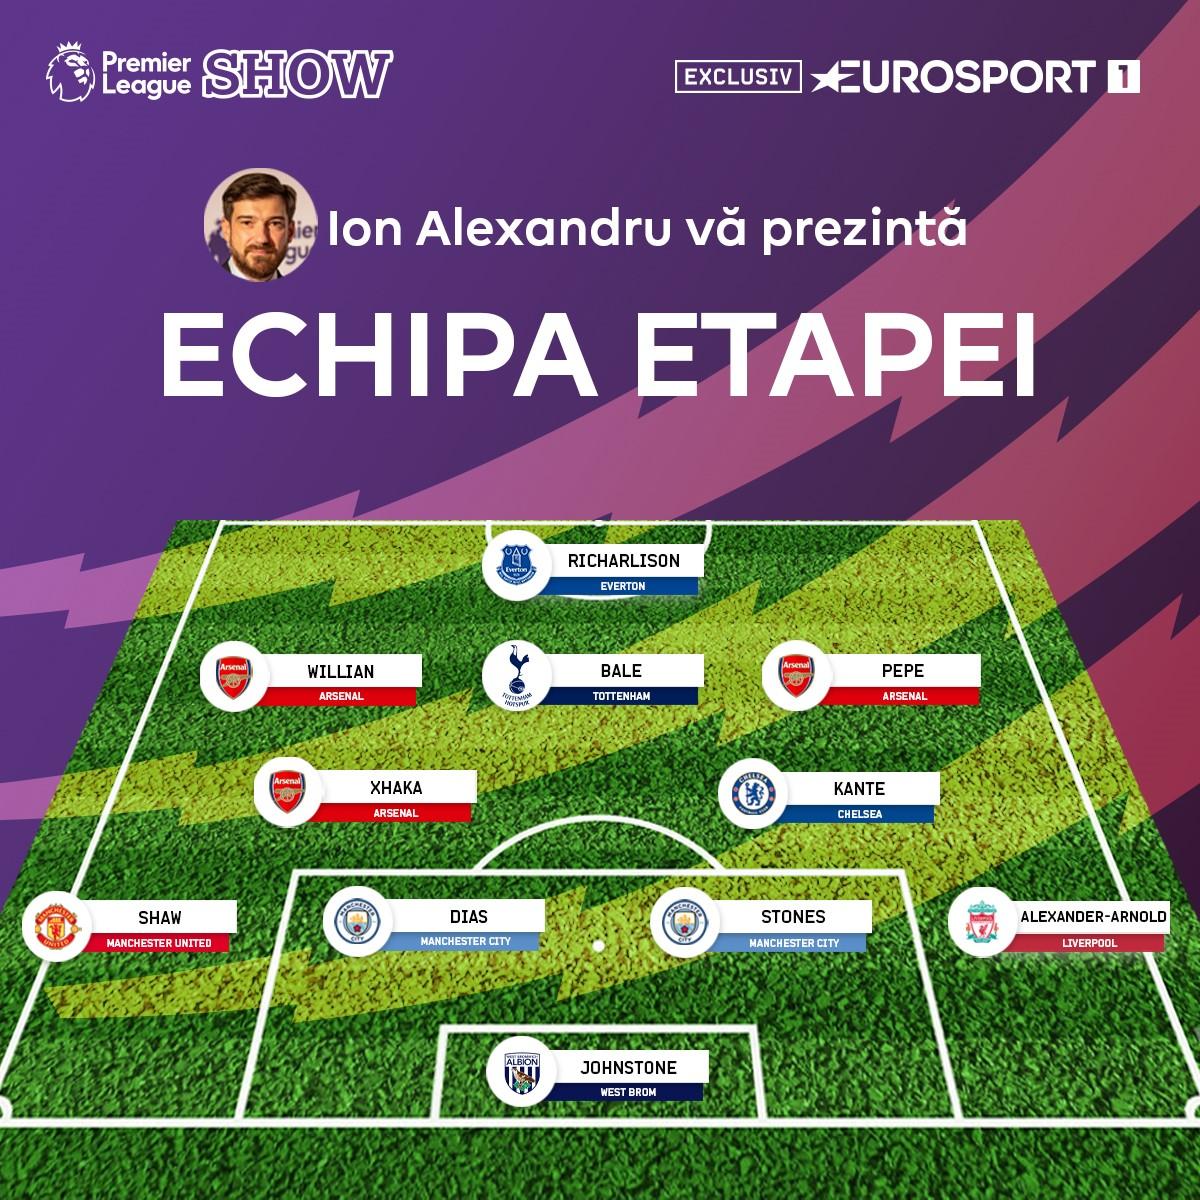 https://i.eurosport.com/2021/03/02/3004356.jpg